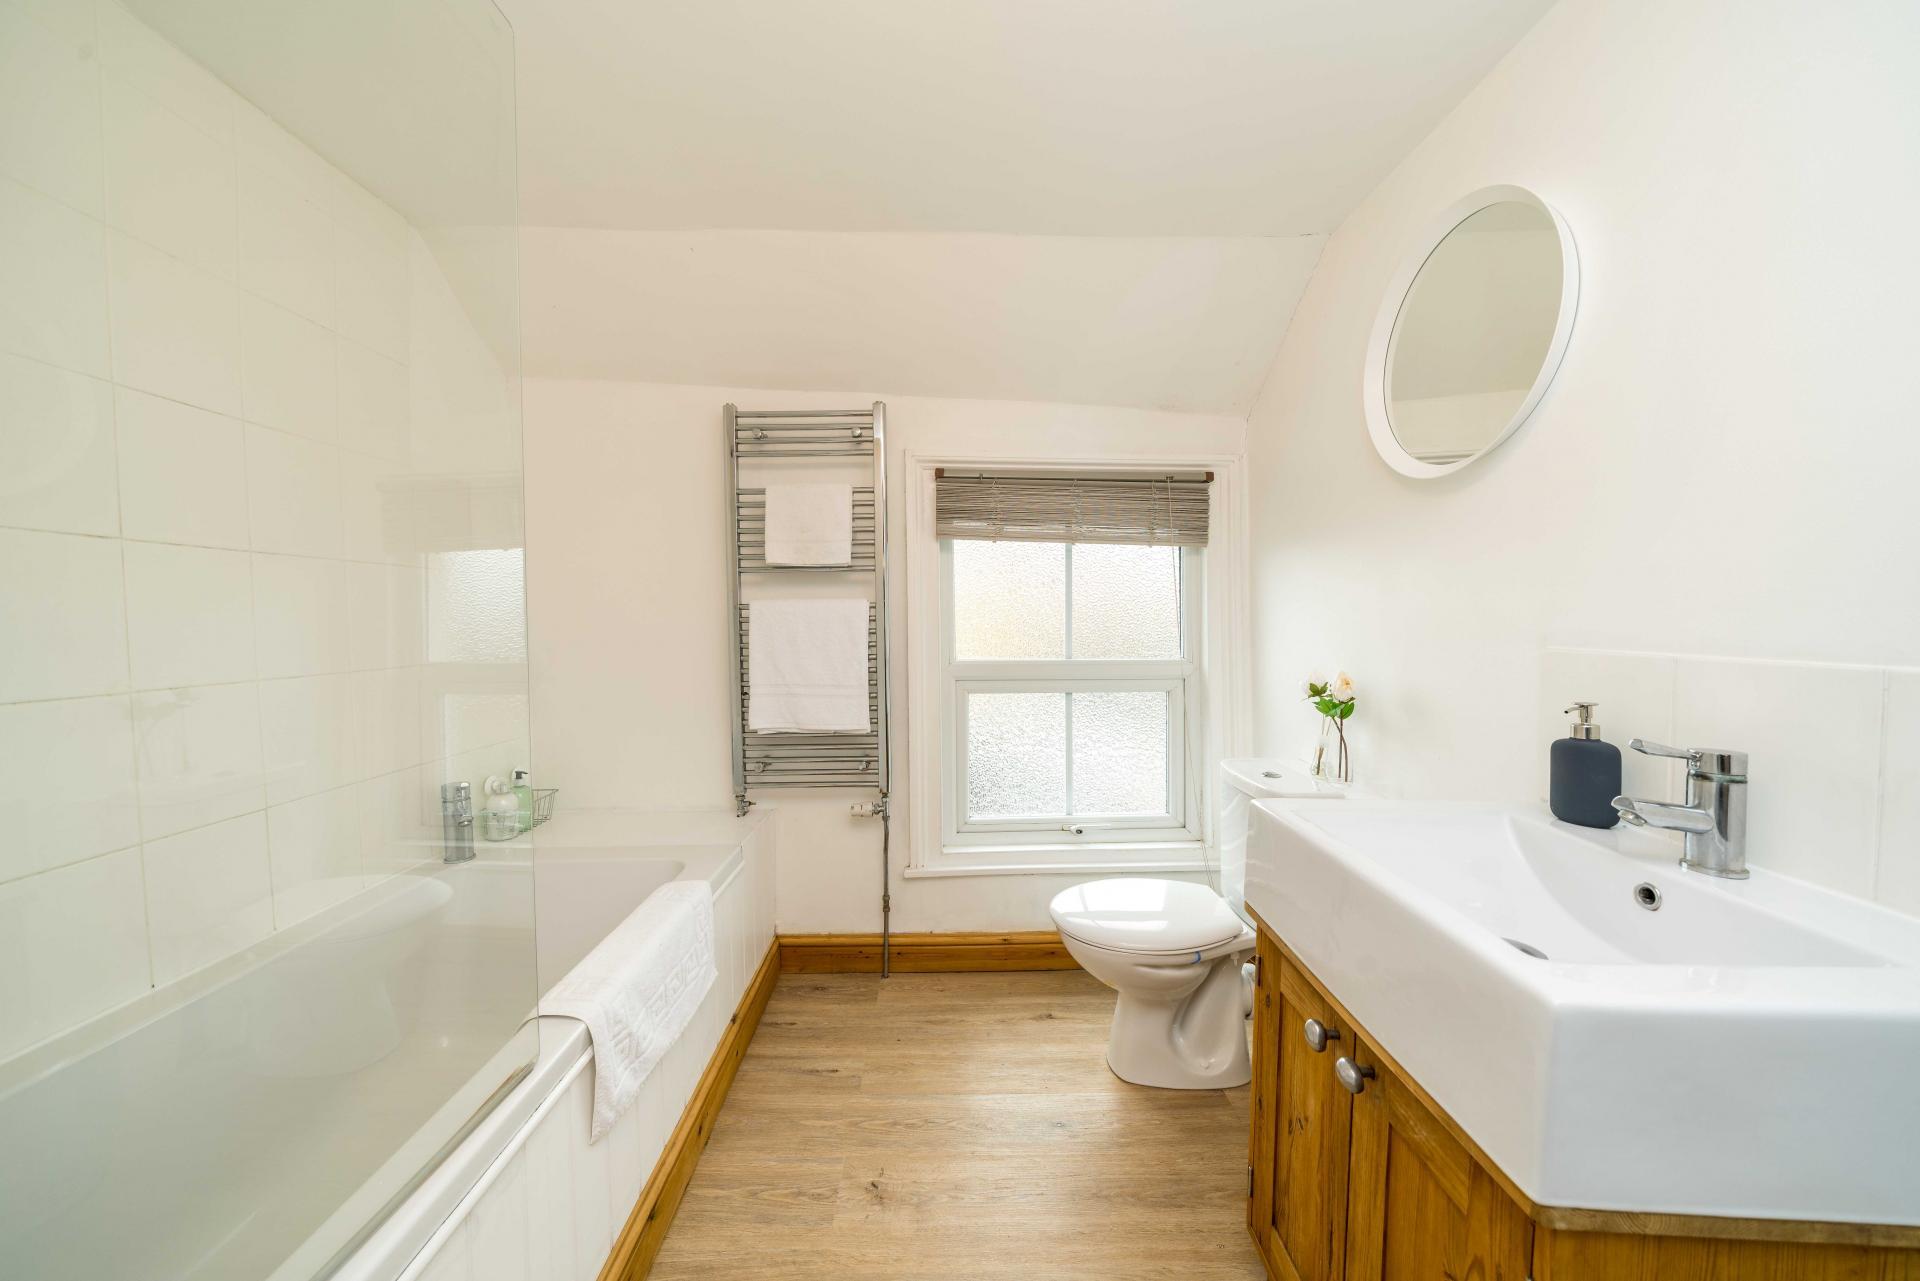 Bathroom at Stocks Hill House